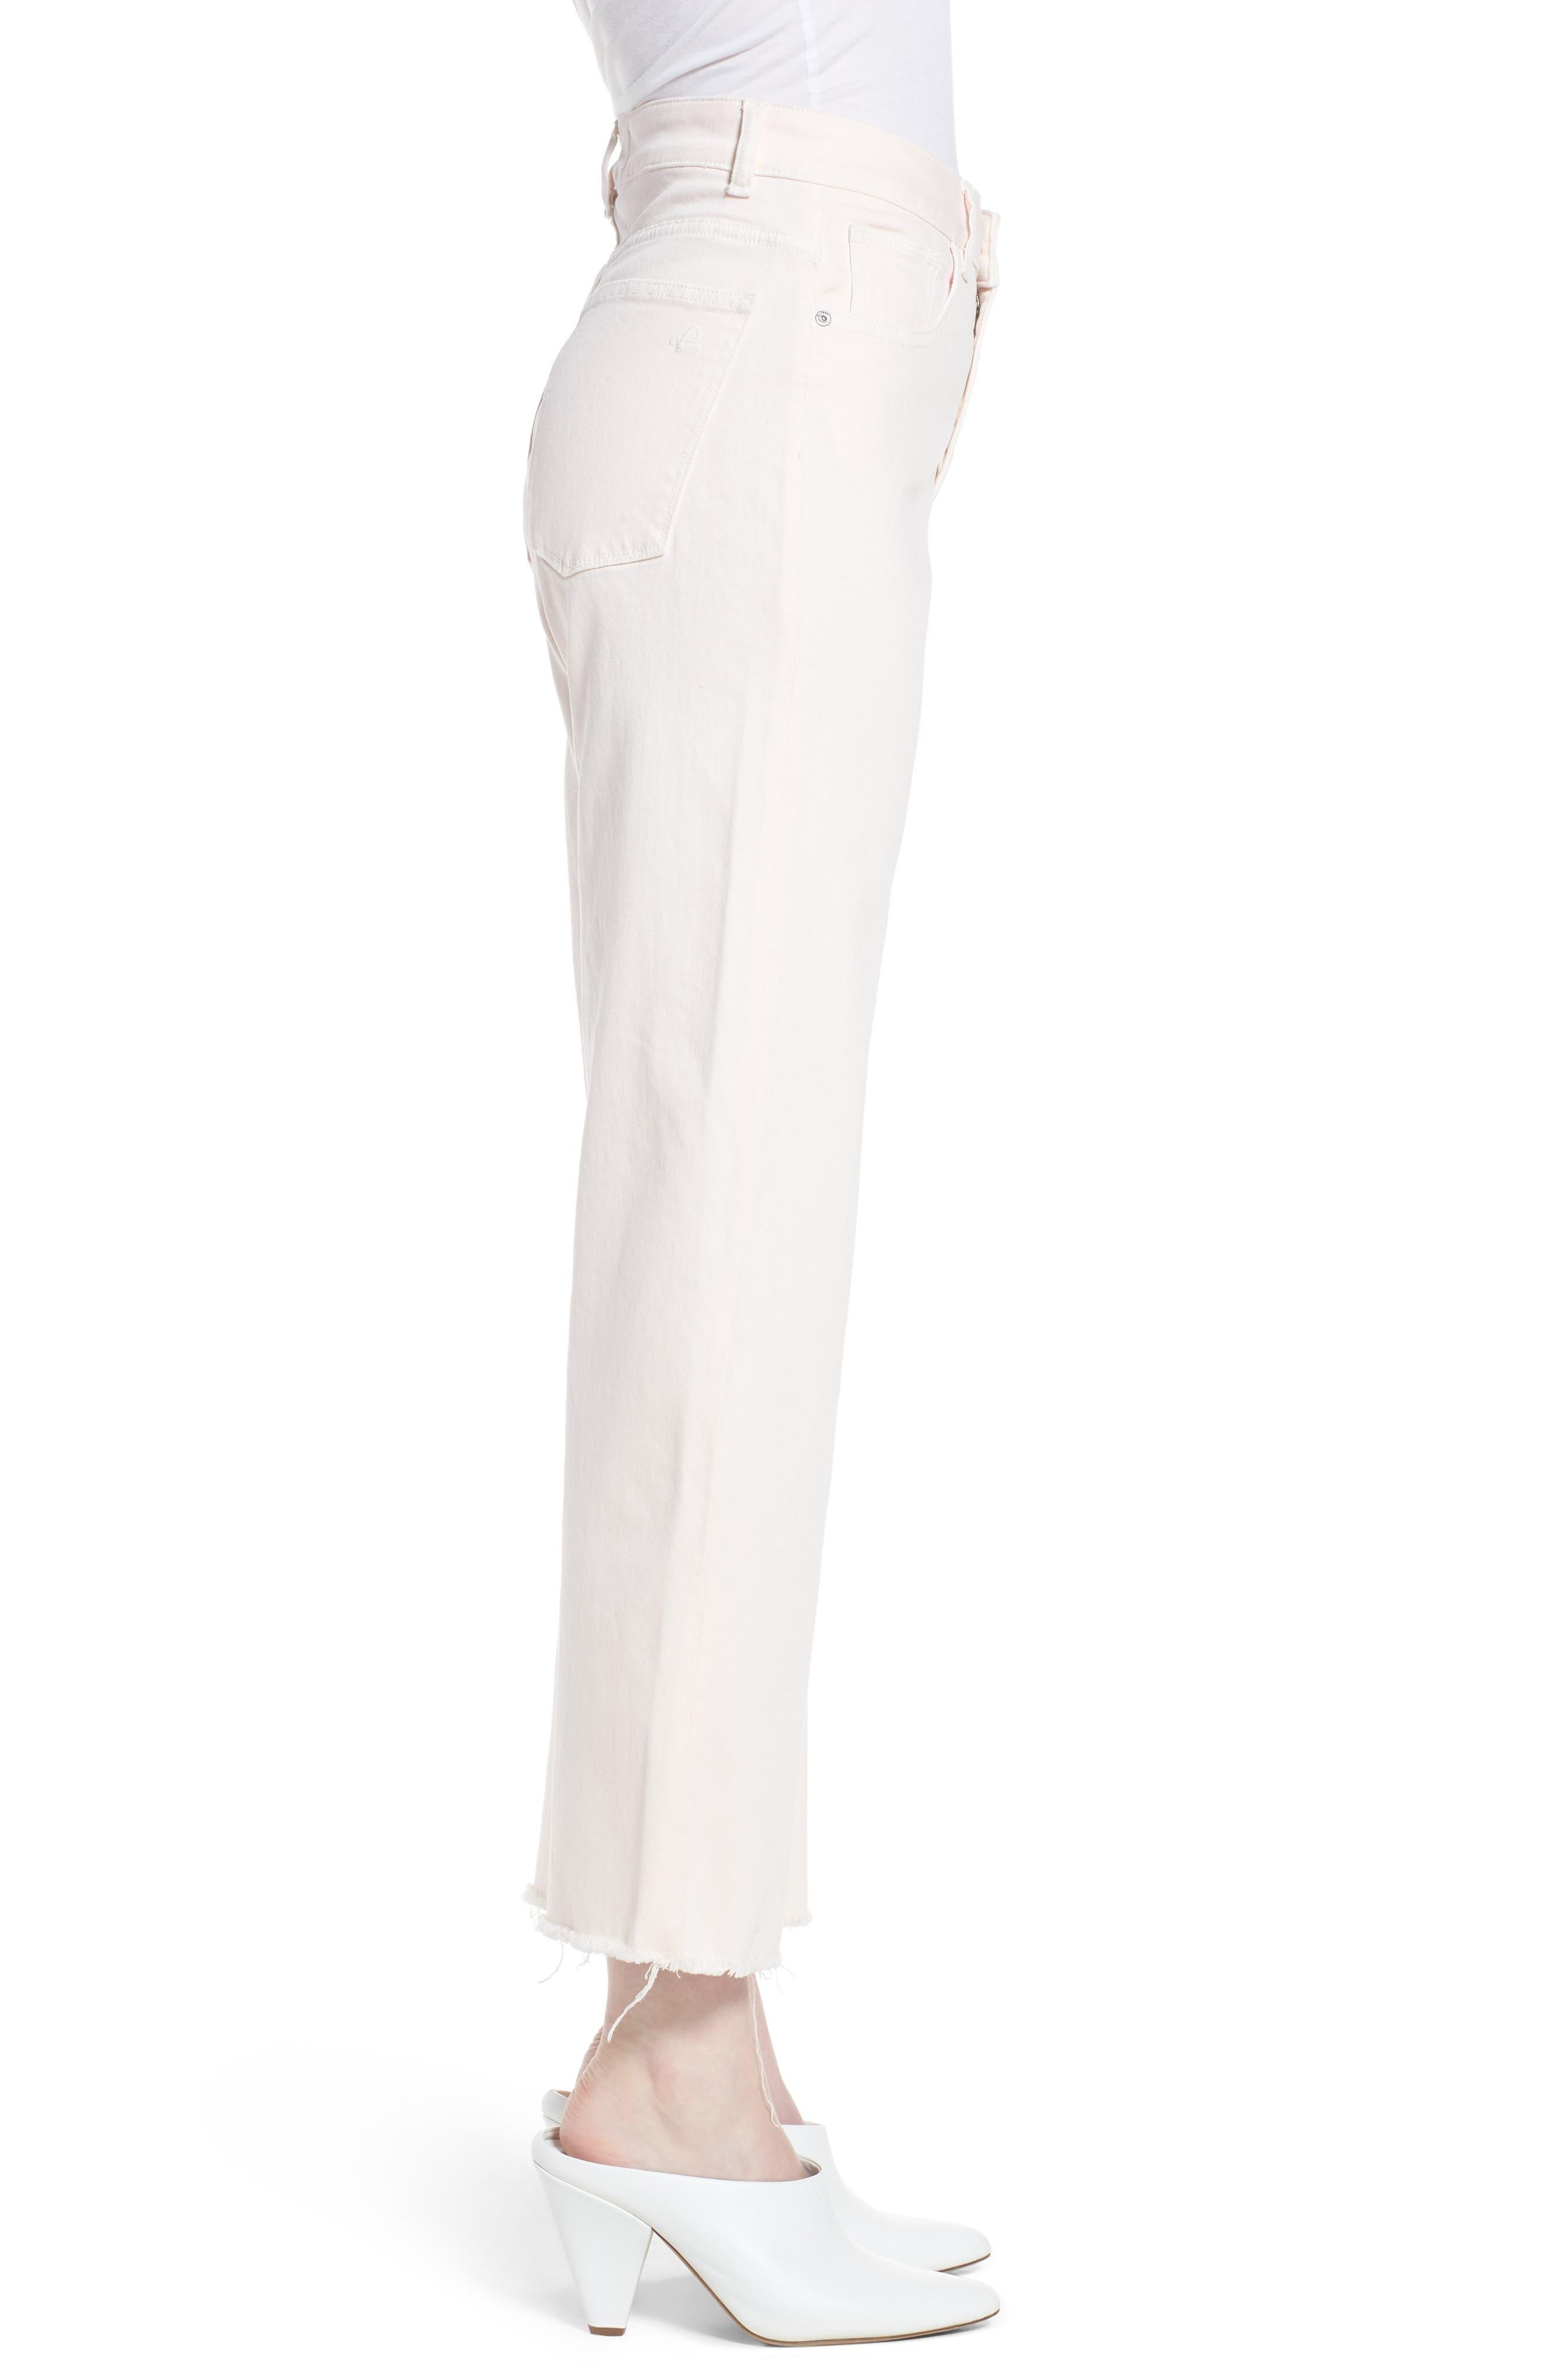 Hepburn Ankle Wide Leg Jeans,                             Alternate thumbnail 3, color,                             651